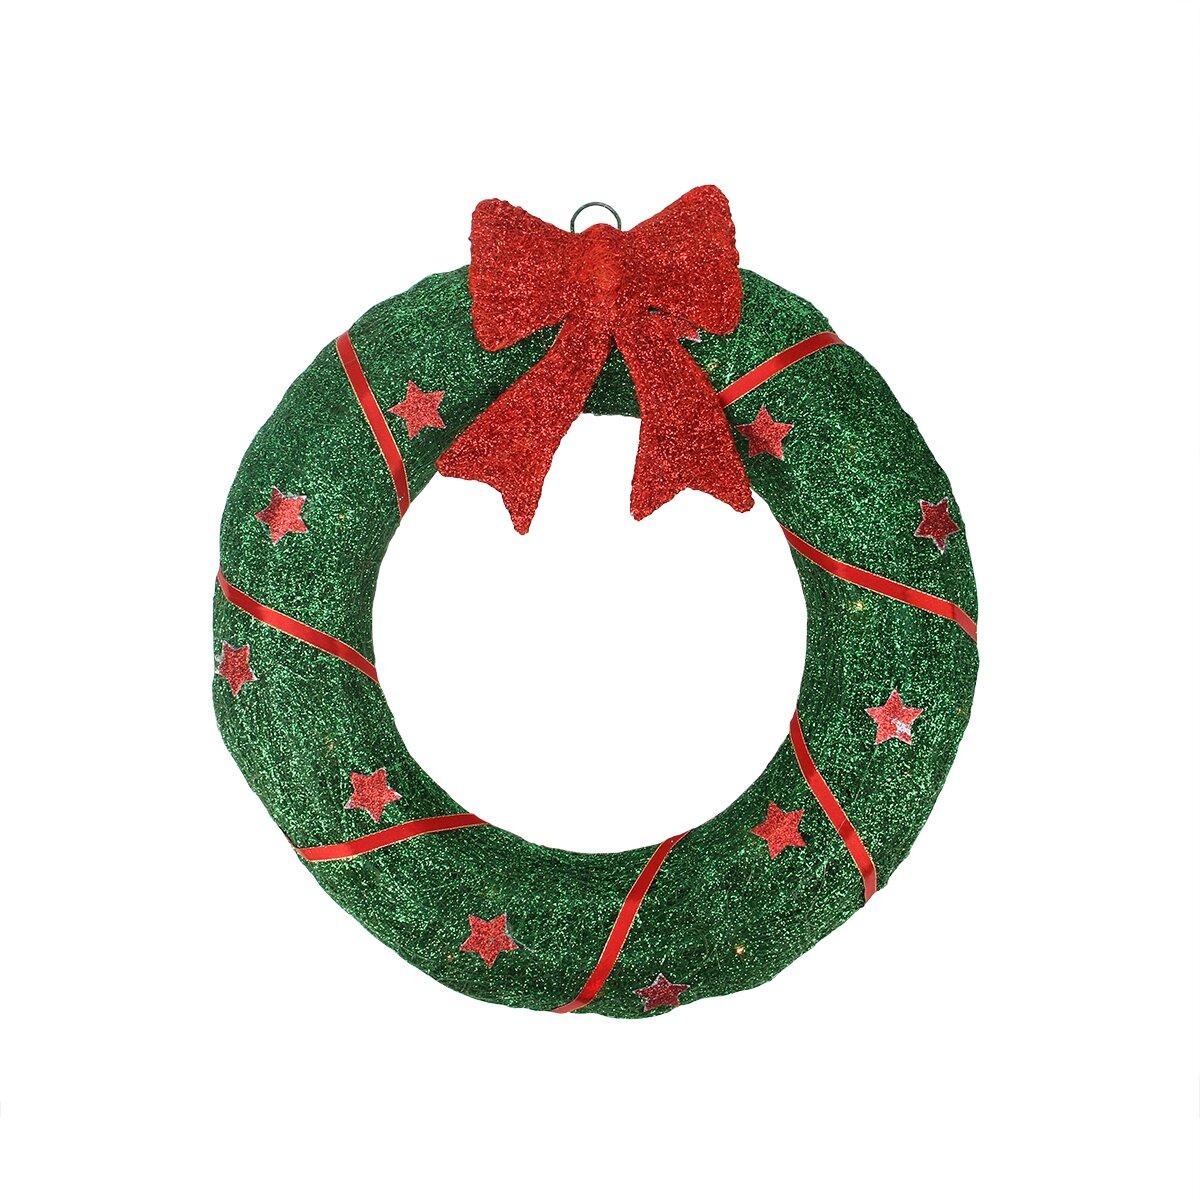 seasonal lighted sparkling sisal christmas wreath yard art decoration. Black Bedroom Furniture Sets. Home Design Ideas